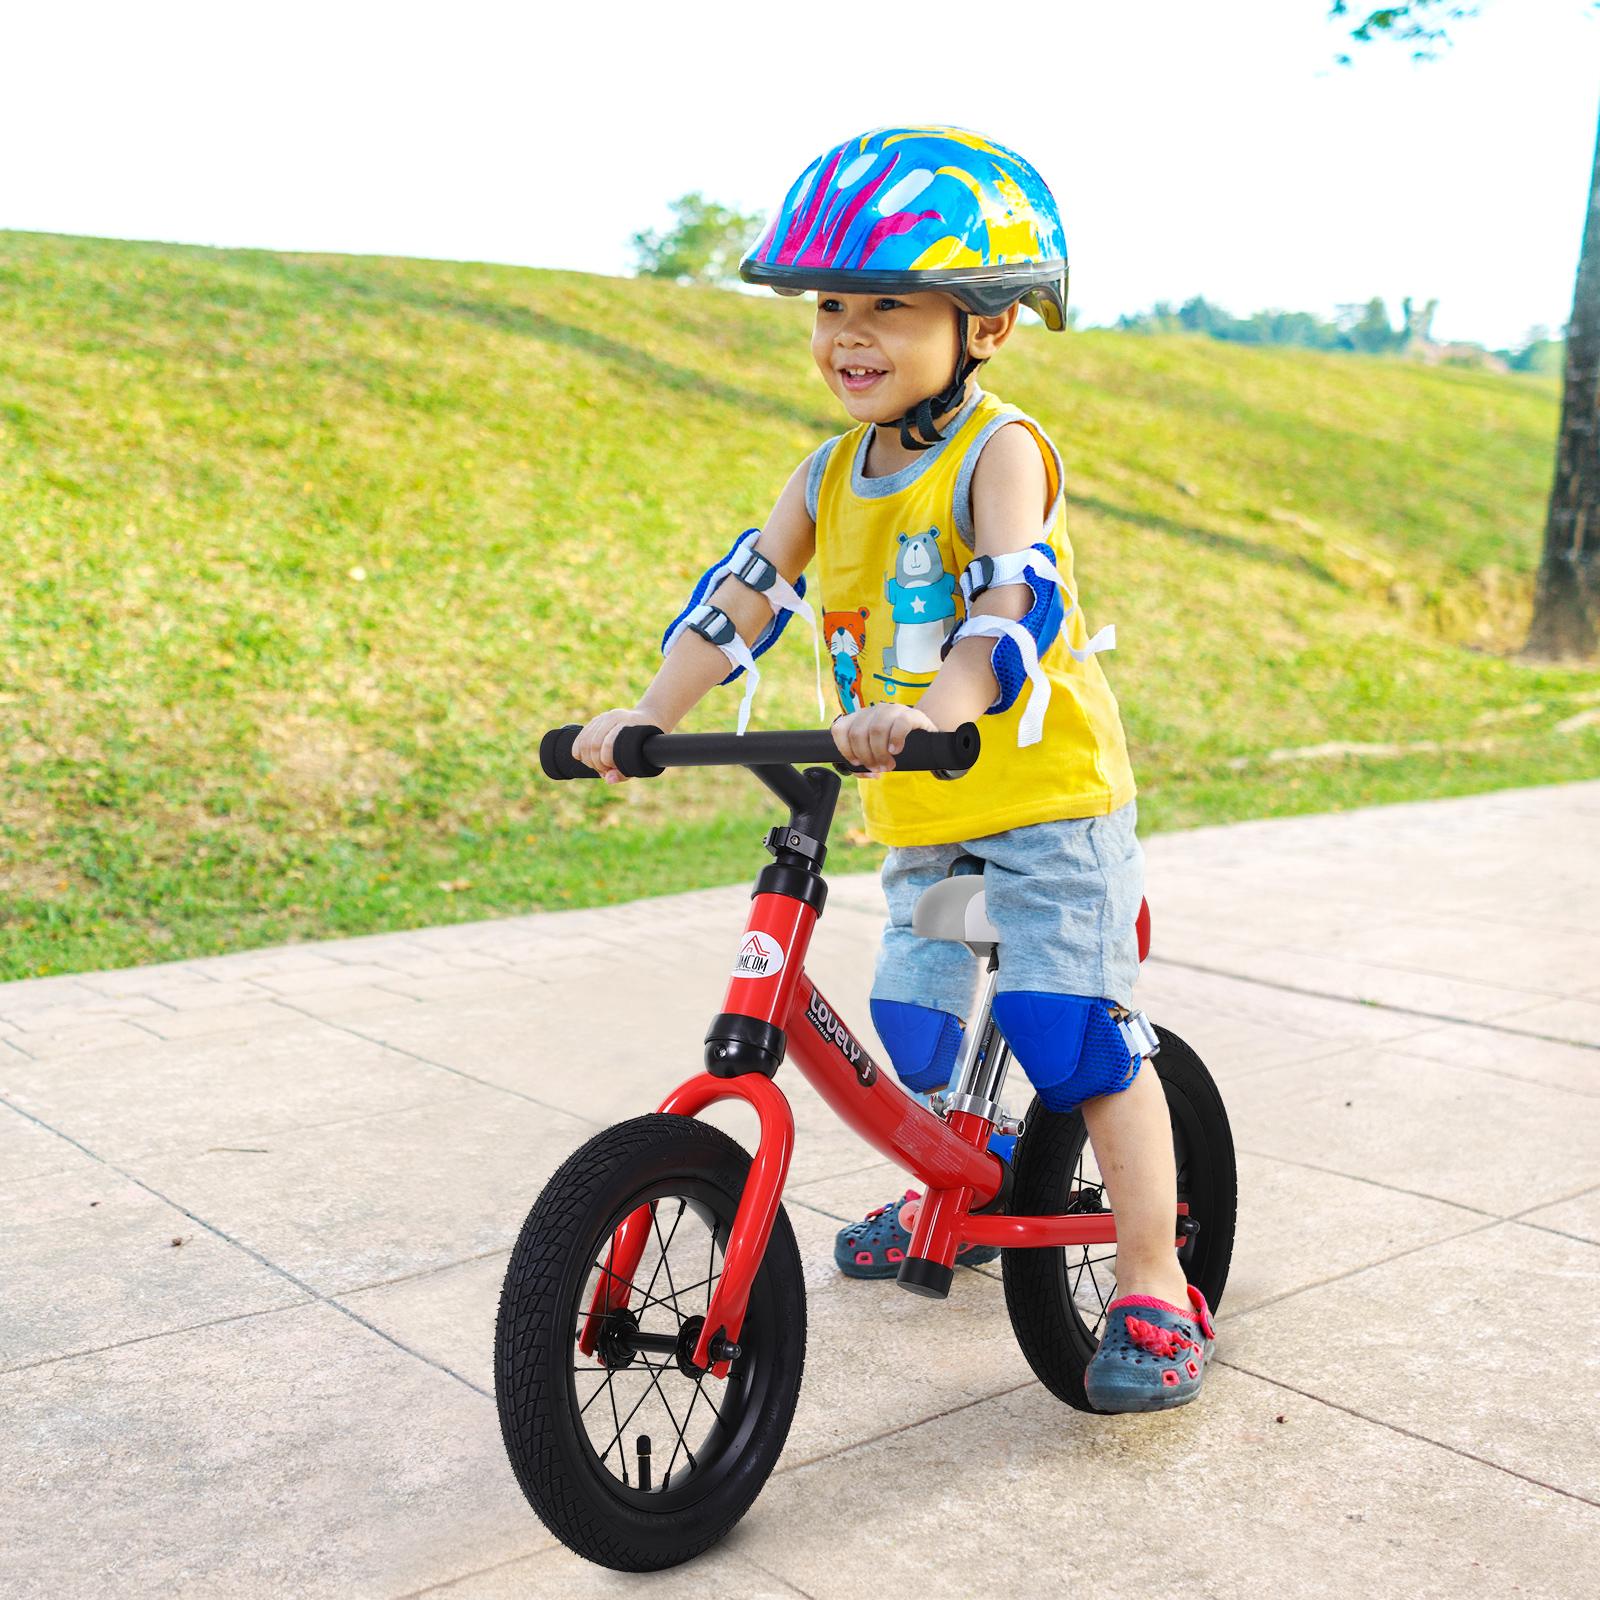 Bicicleta-sin-Pedales-de-Altura-de-Asiento-Regulable-31-45cm-2-5-Anos miniatura 24